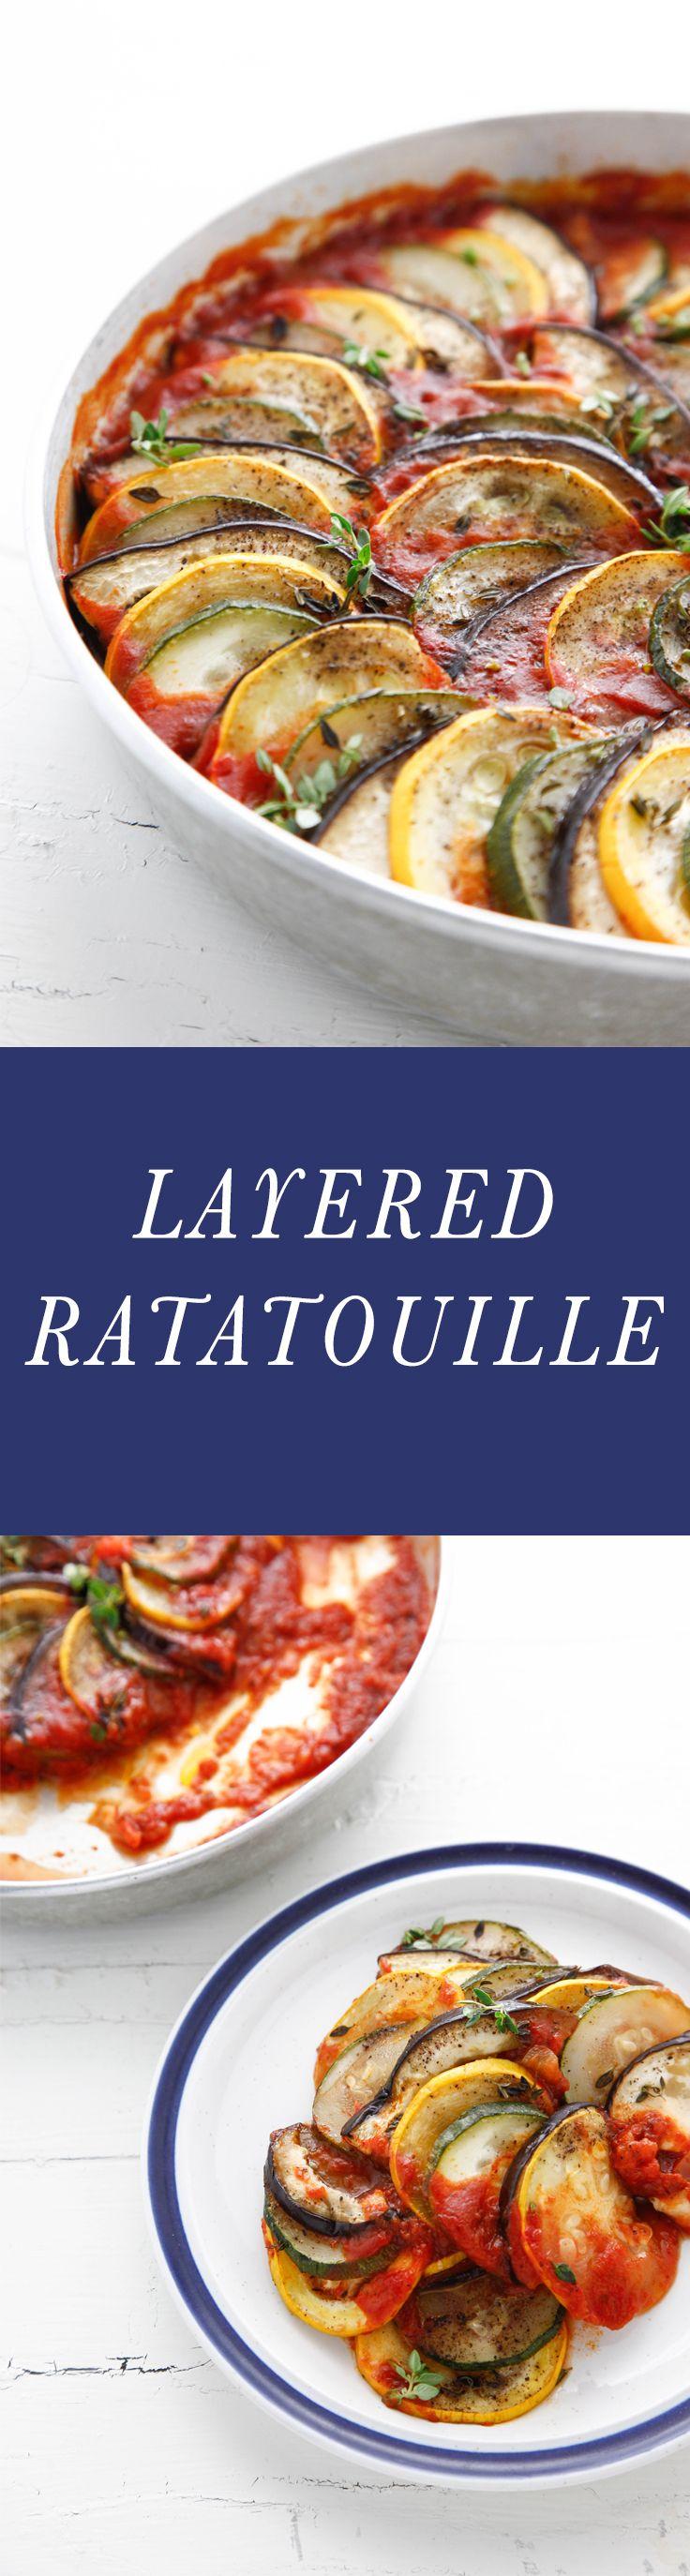 Layered ratatouille recipe food food recipes cooking